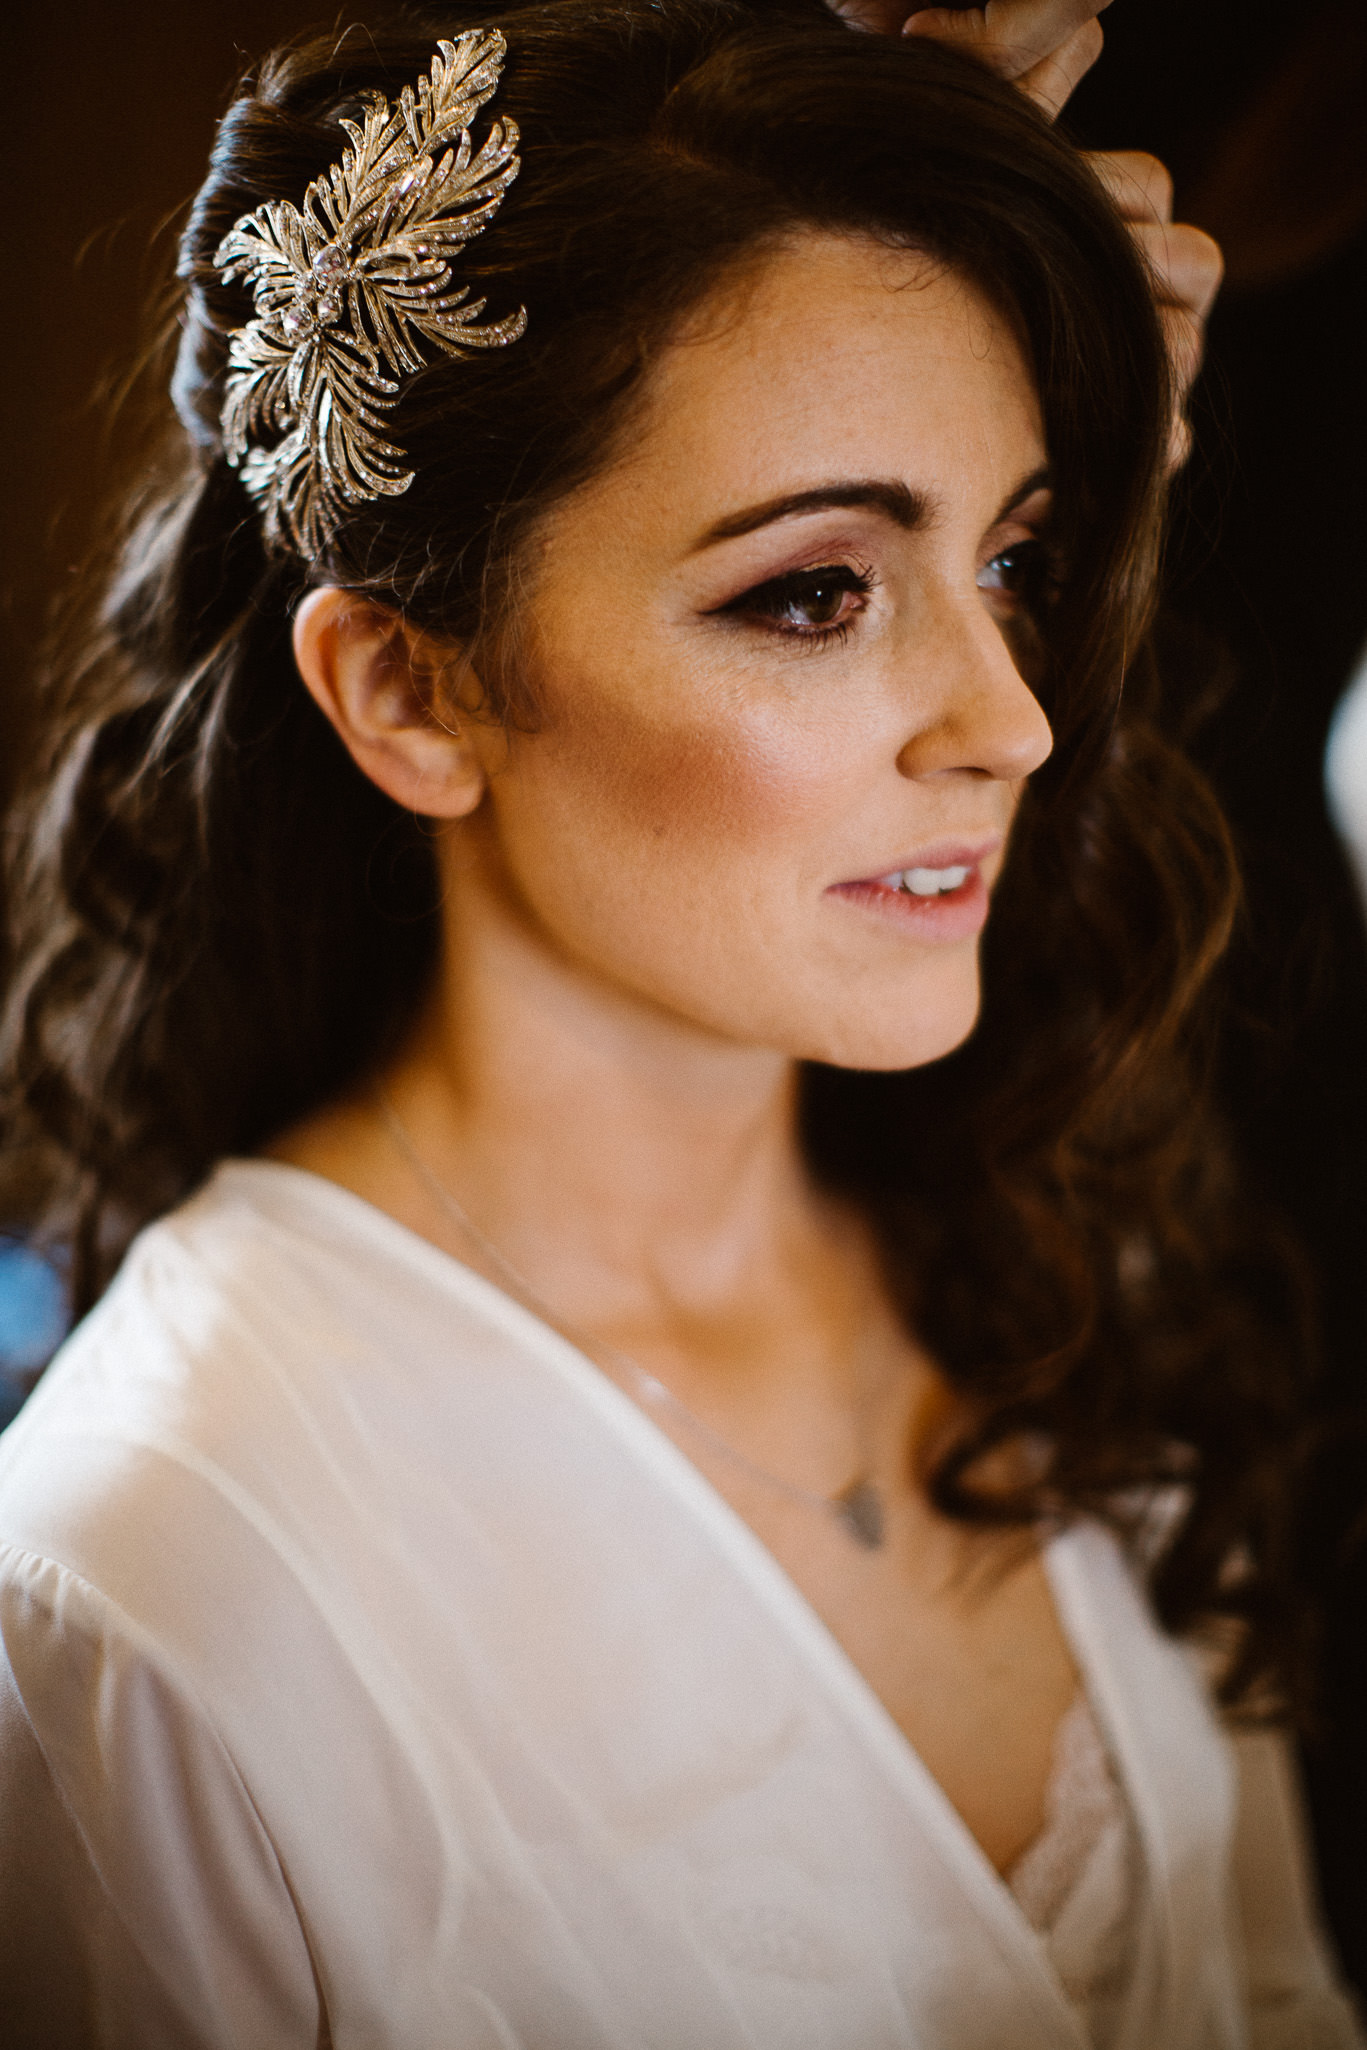 clairebyrnephotography-wedding-night-sparklers-new-years-eve-denyce-leonard-1.jpg